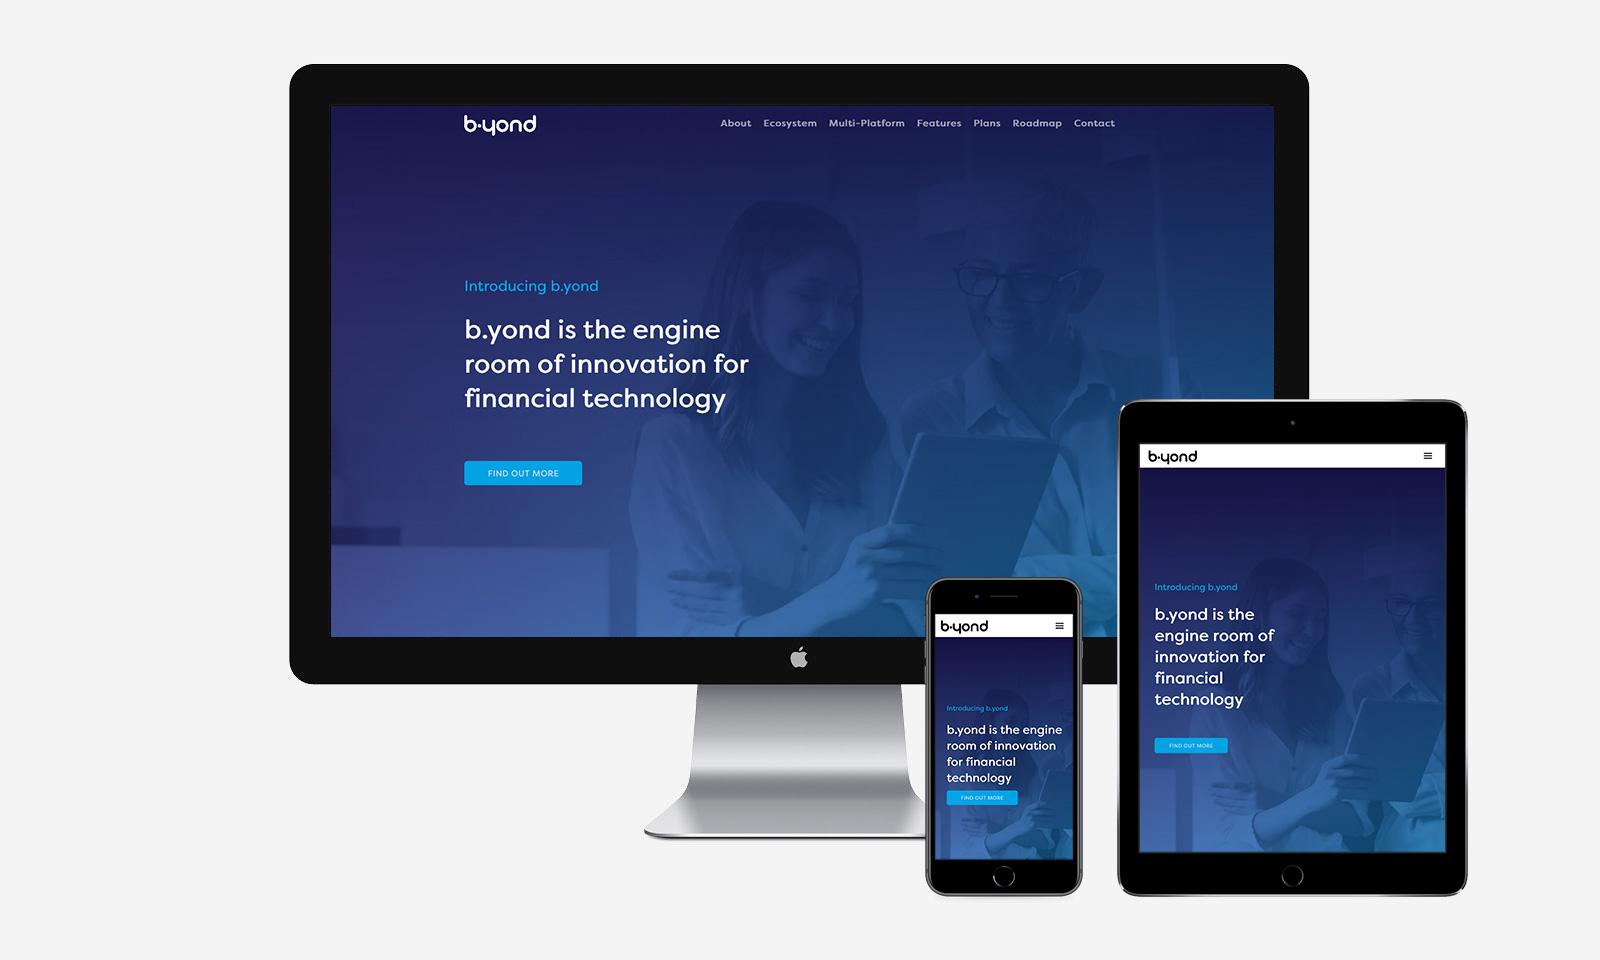 b.yond website responsive design launch